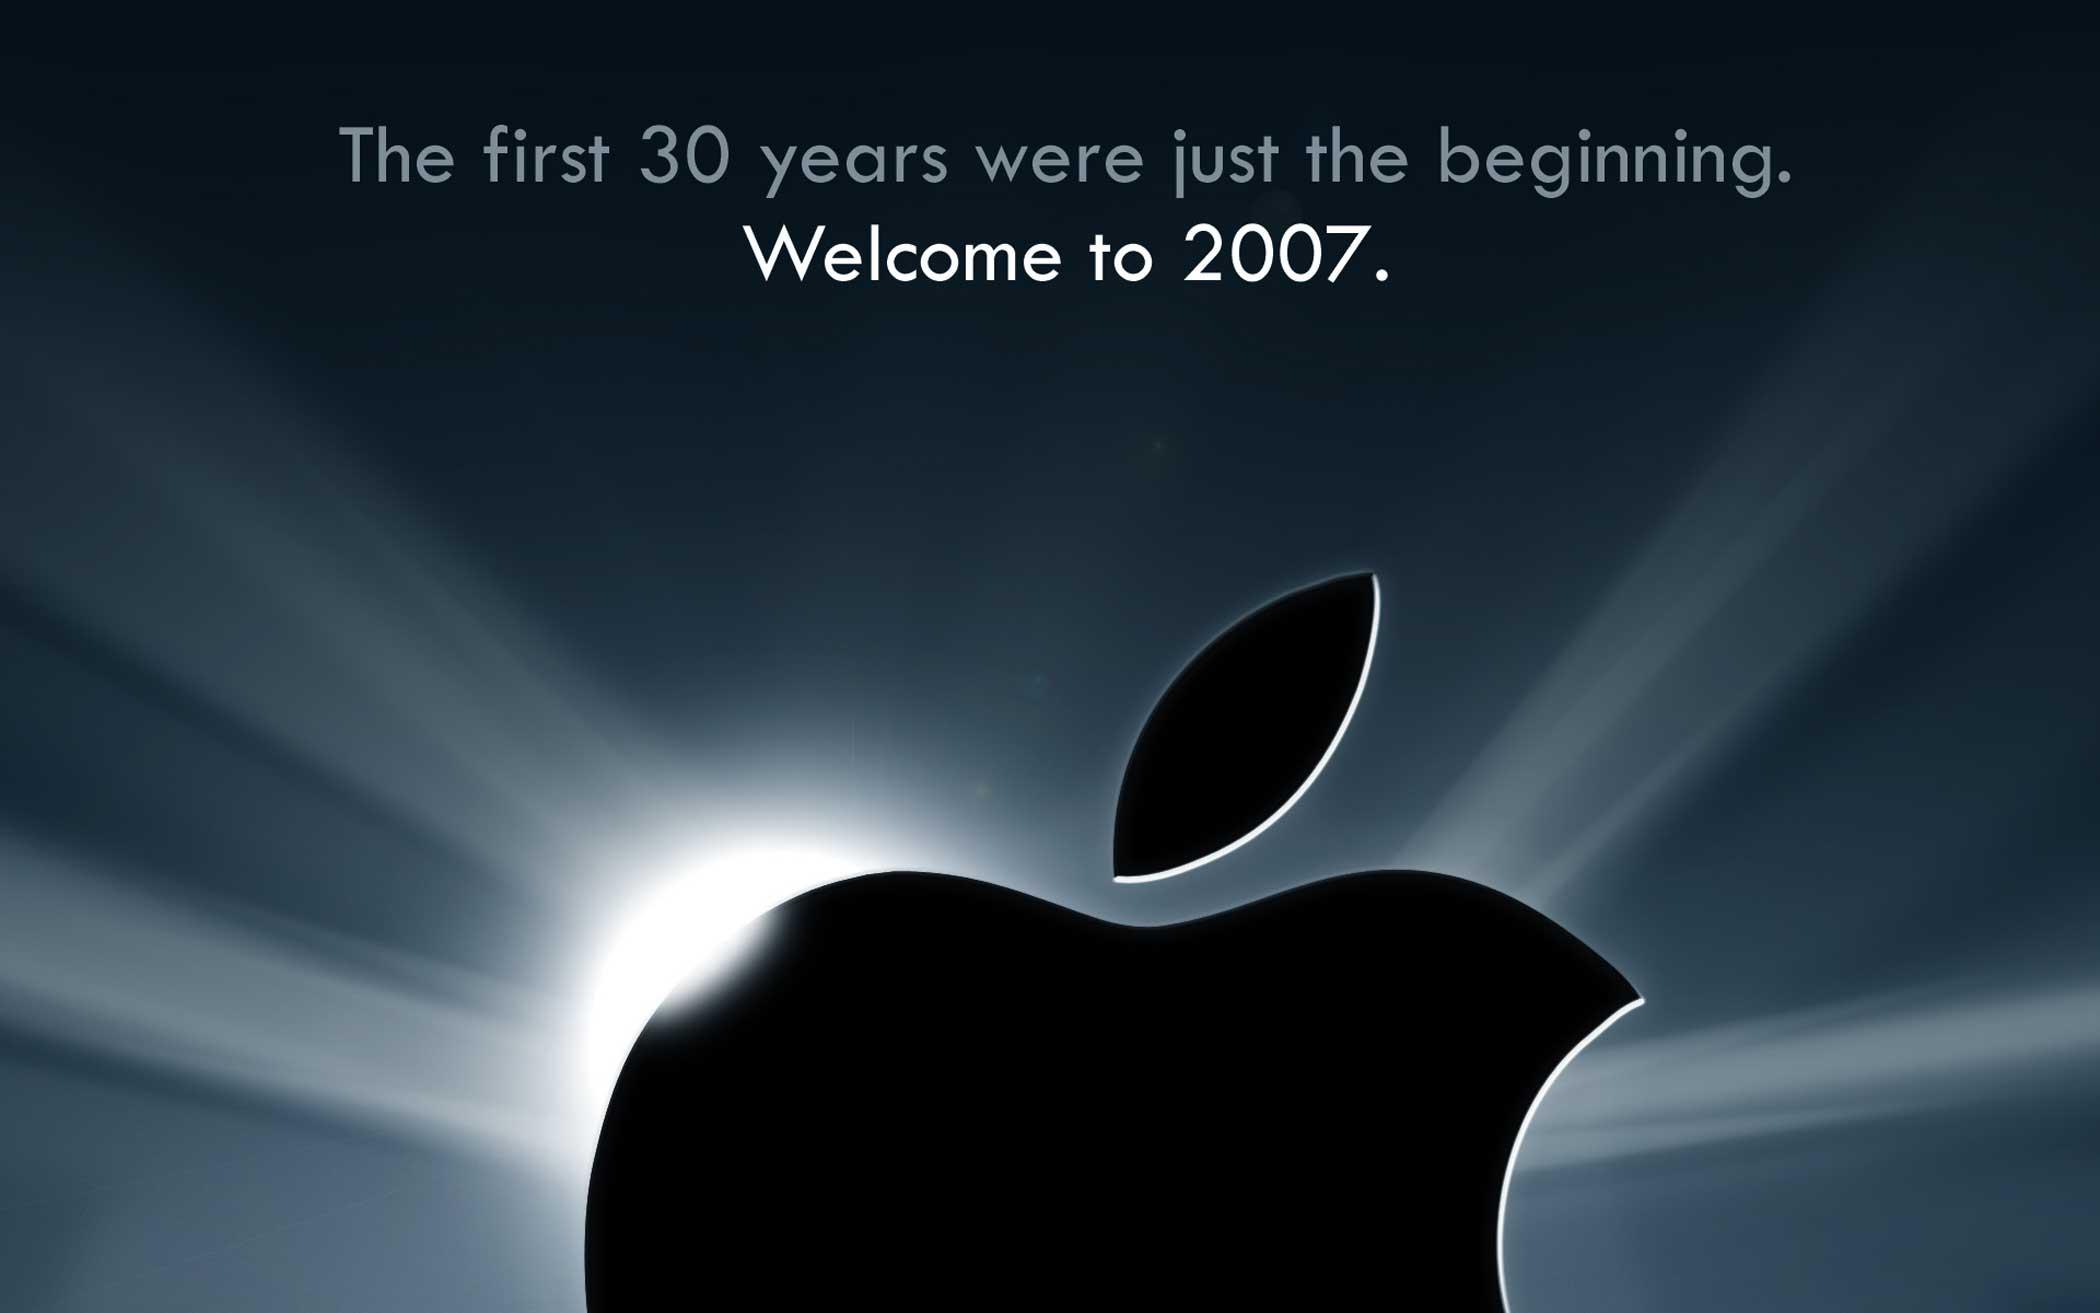 iPhone, January 2007